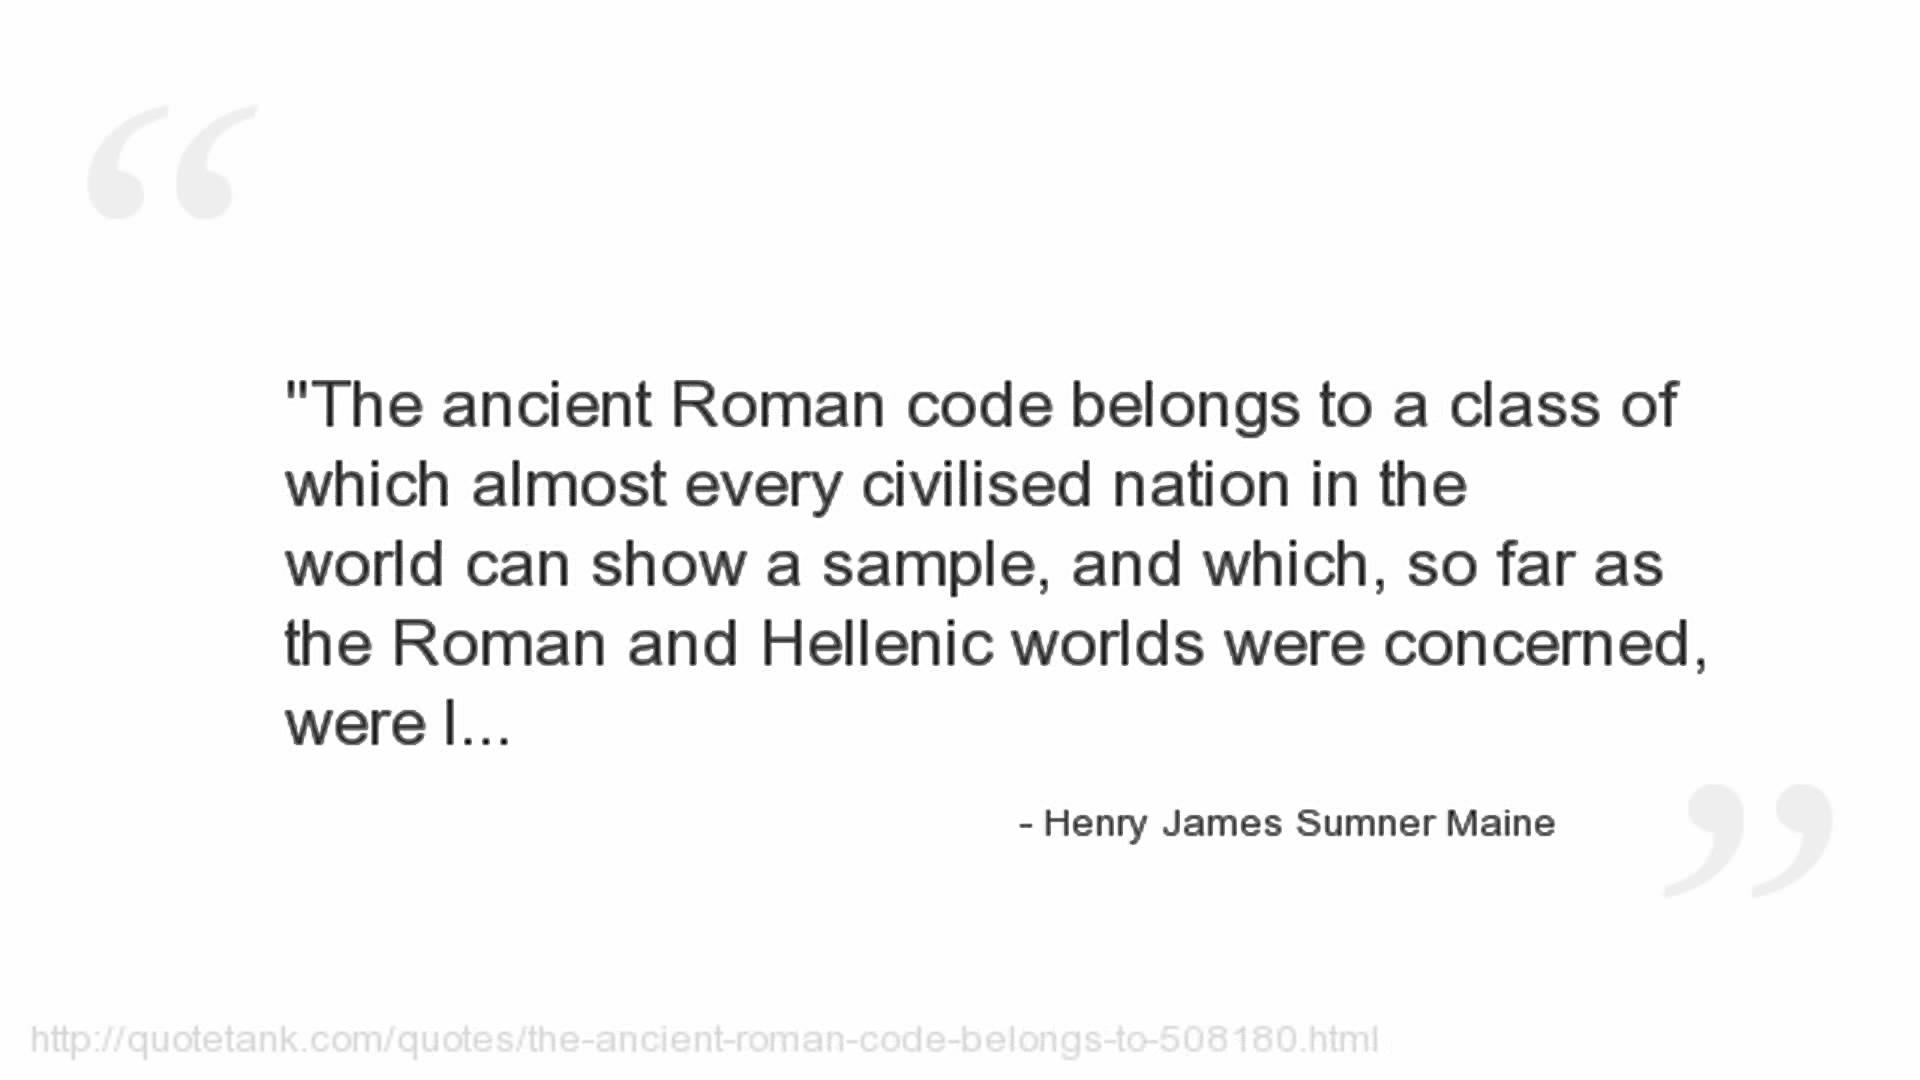 Henry James Sumner Maine's quote #2